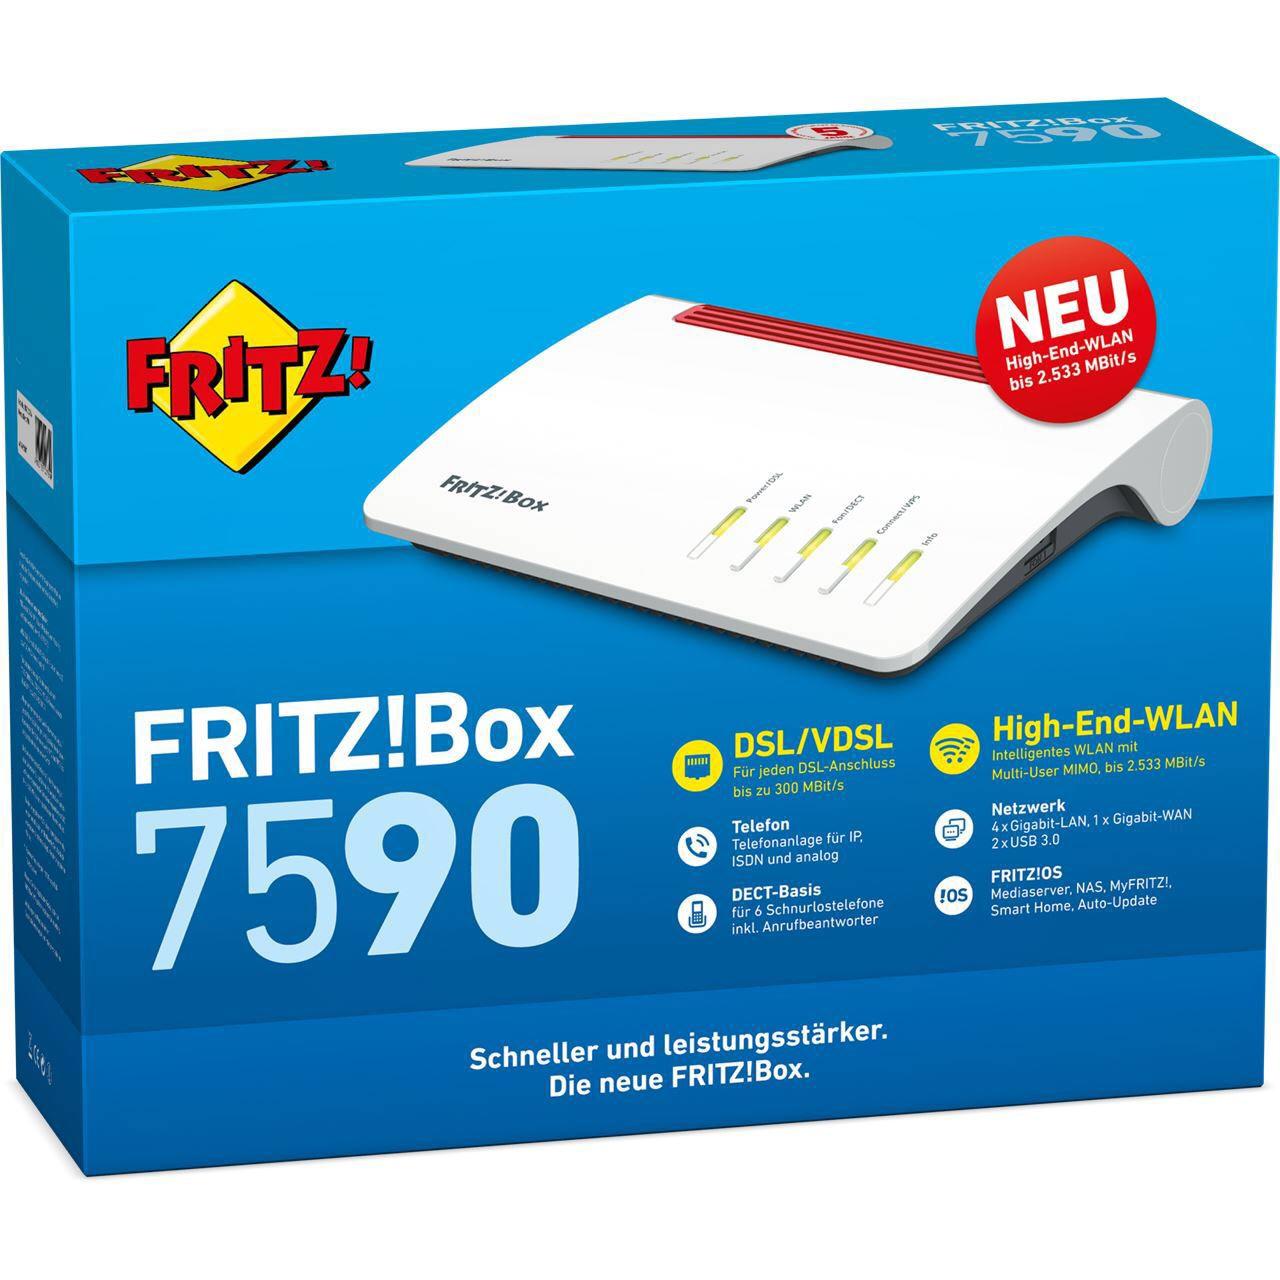 AVM Fritzbox 7590 A/CH Warehouse Amazon.co.uk